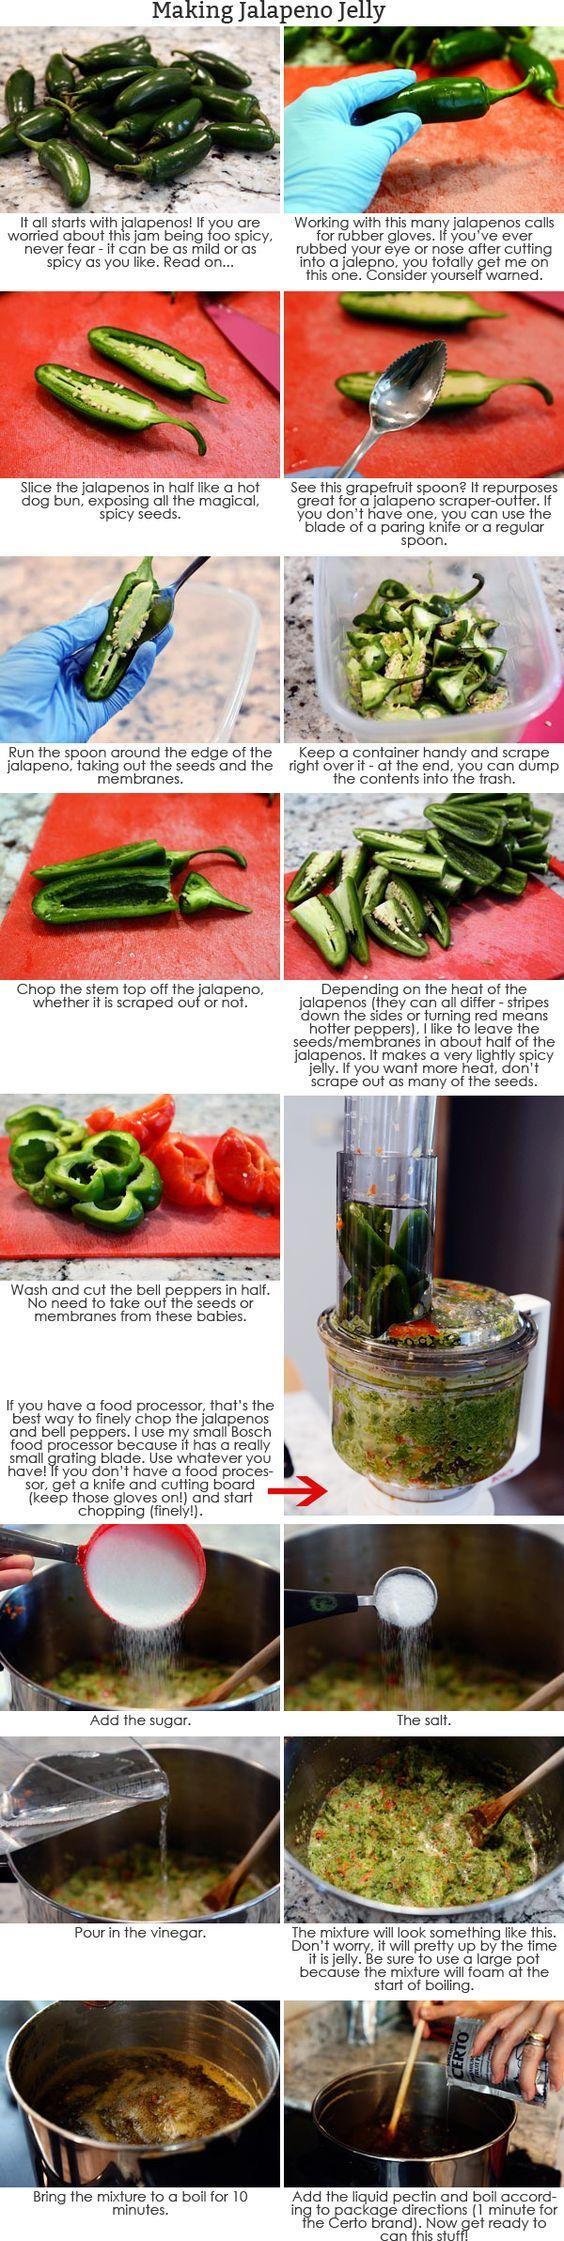 Jalapeno Jelly Recipe Jalapeno Jelly Pepper Jelly Recipes Stuffed Hot Peppers